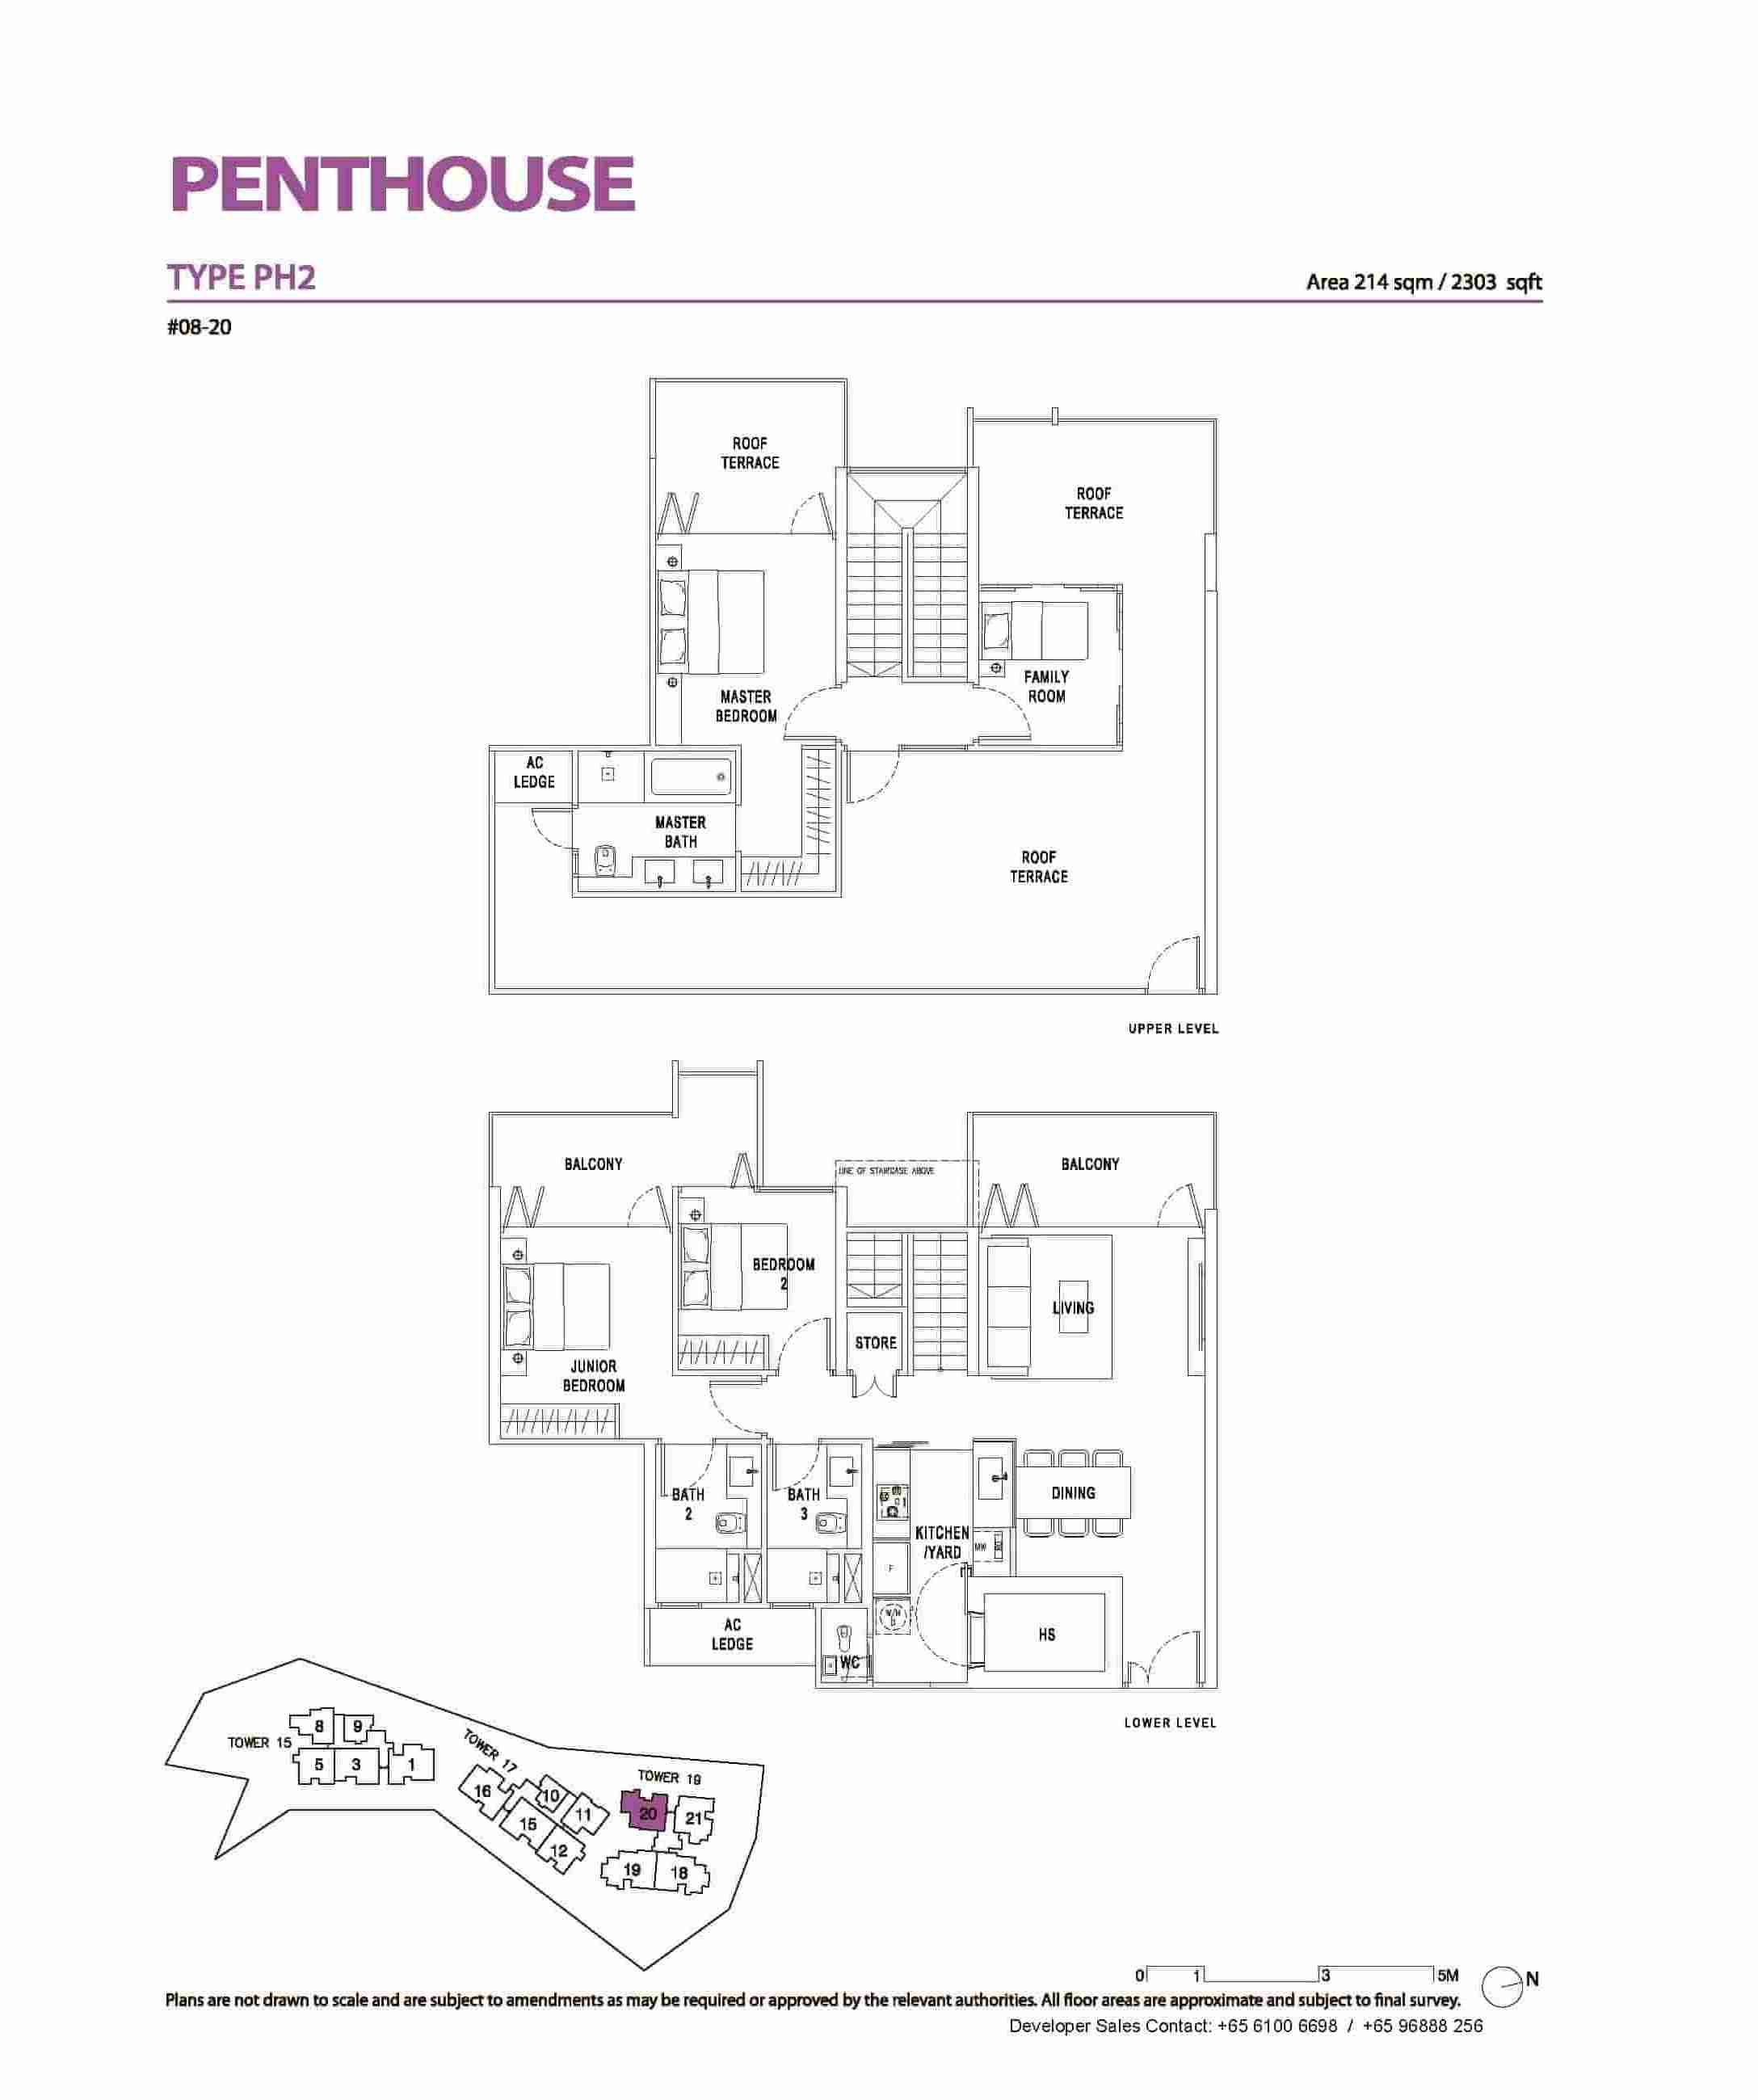 Type PH2 - 3+ FamilyPenthouse